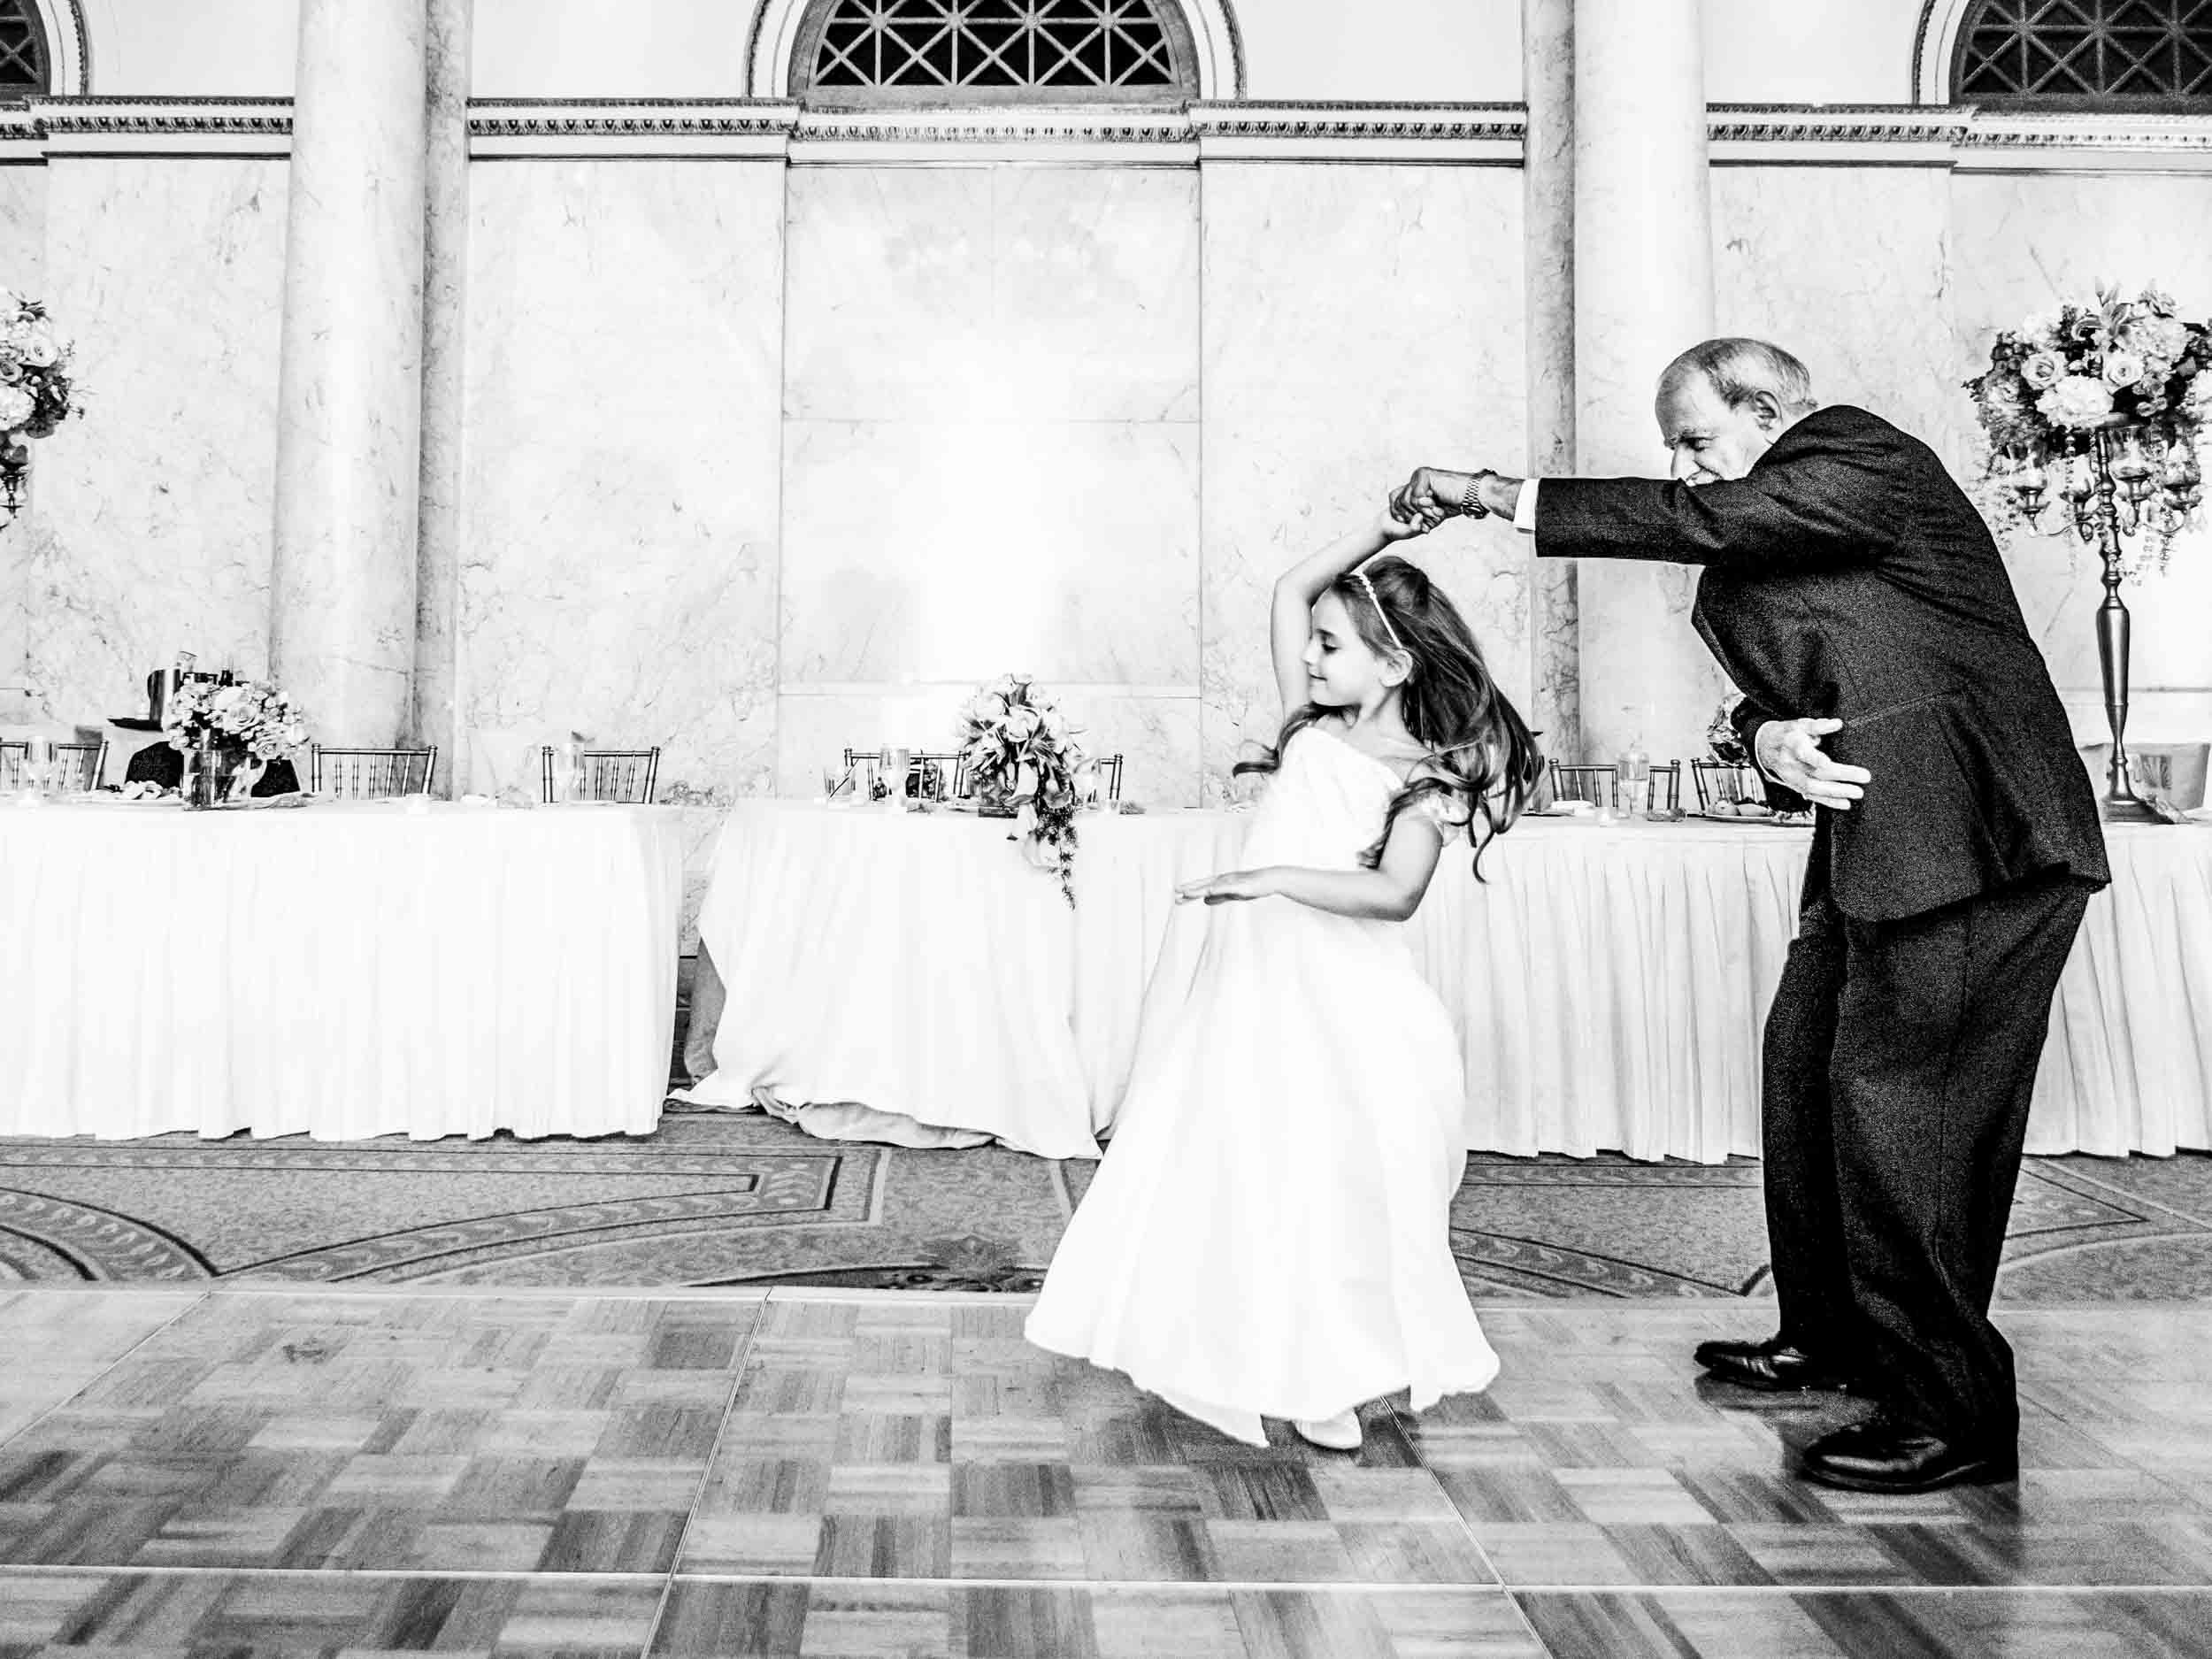 dc+metro+wedding+photographer+vadym+guliuk+photography+wedding+reception-2020.jpg